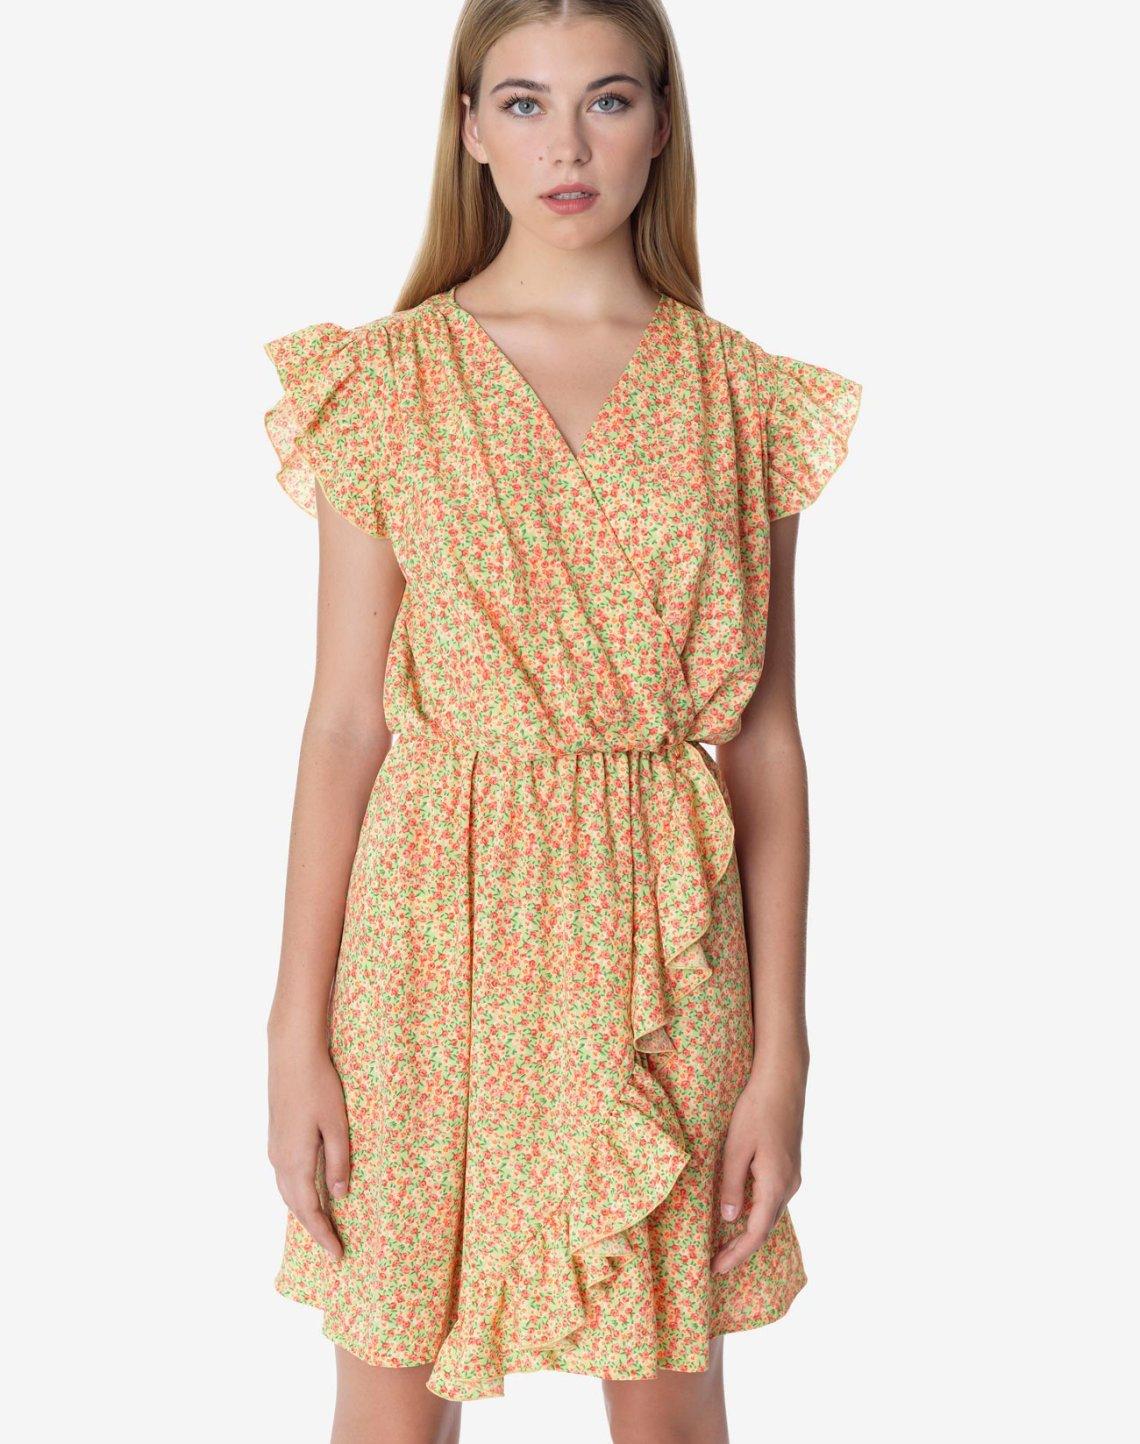 Printed mini dress with ruffles